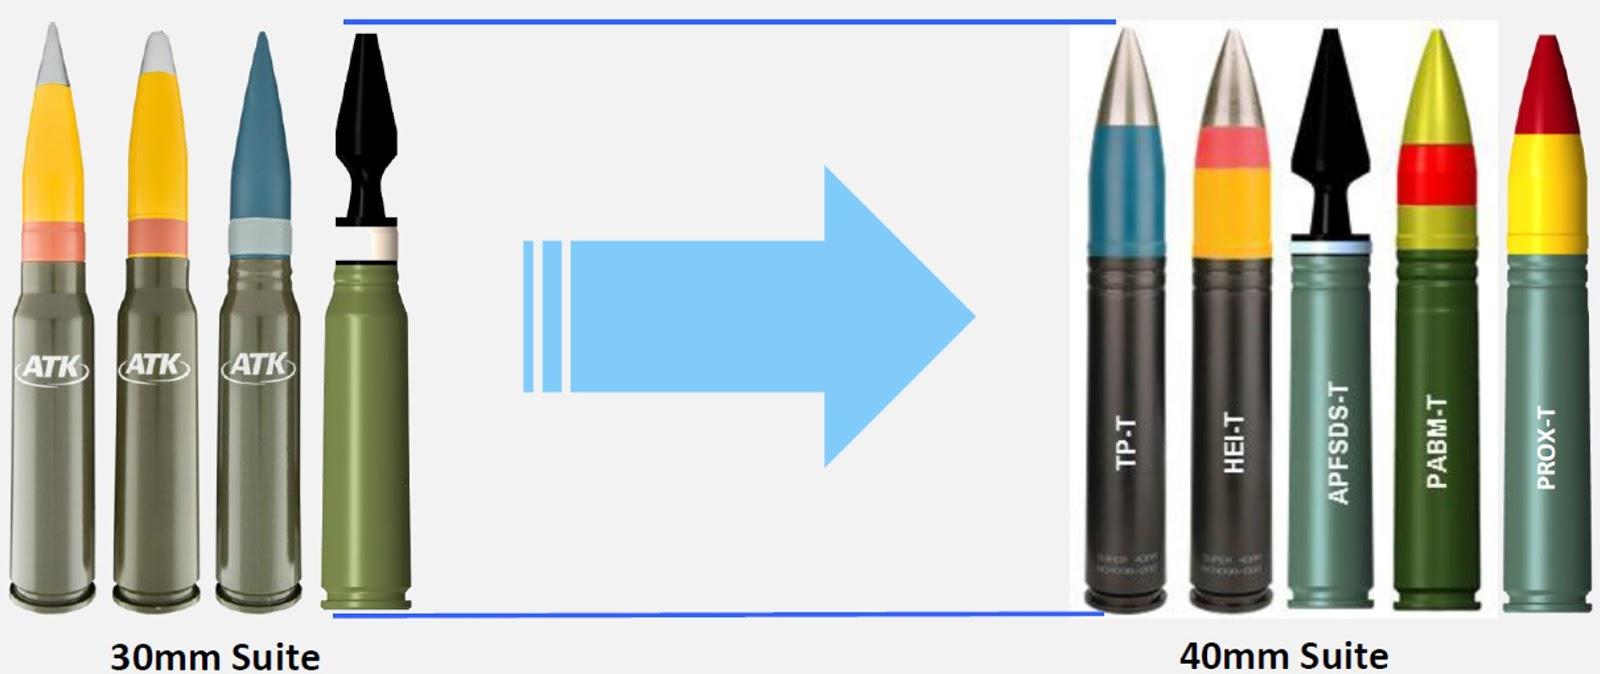 25mm ammunition penetration share